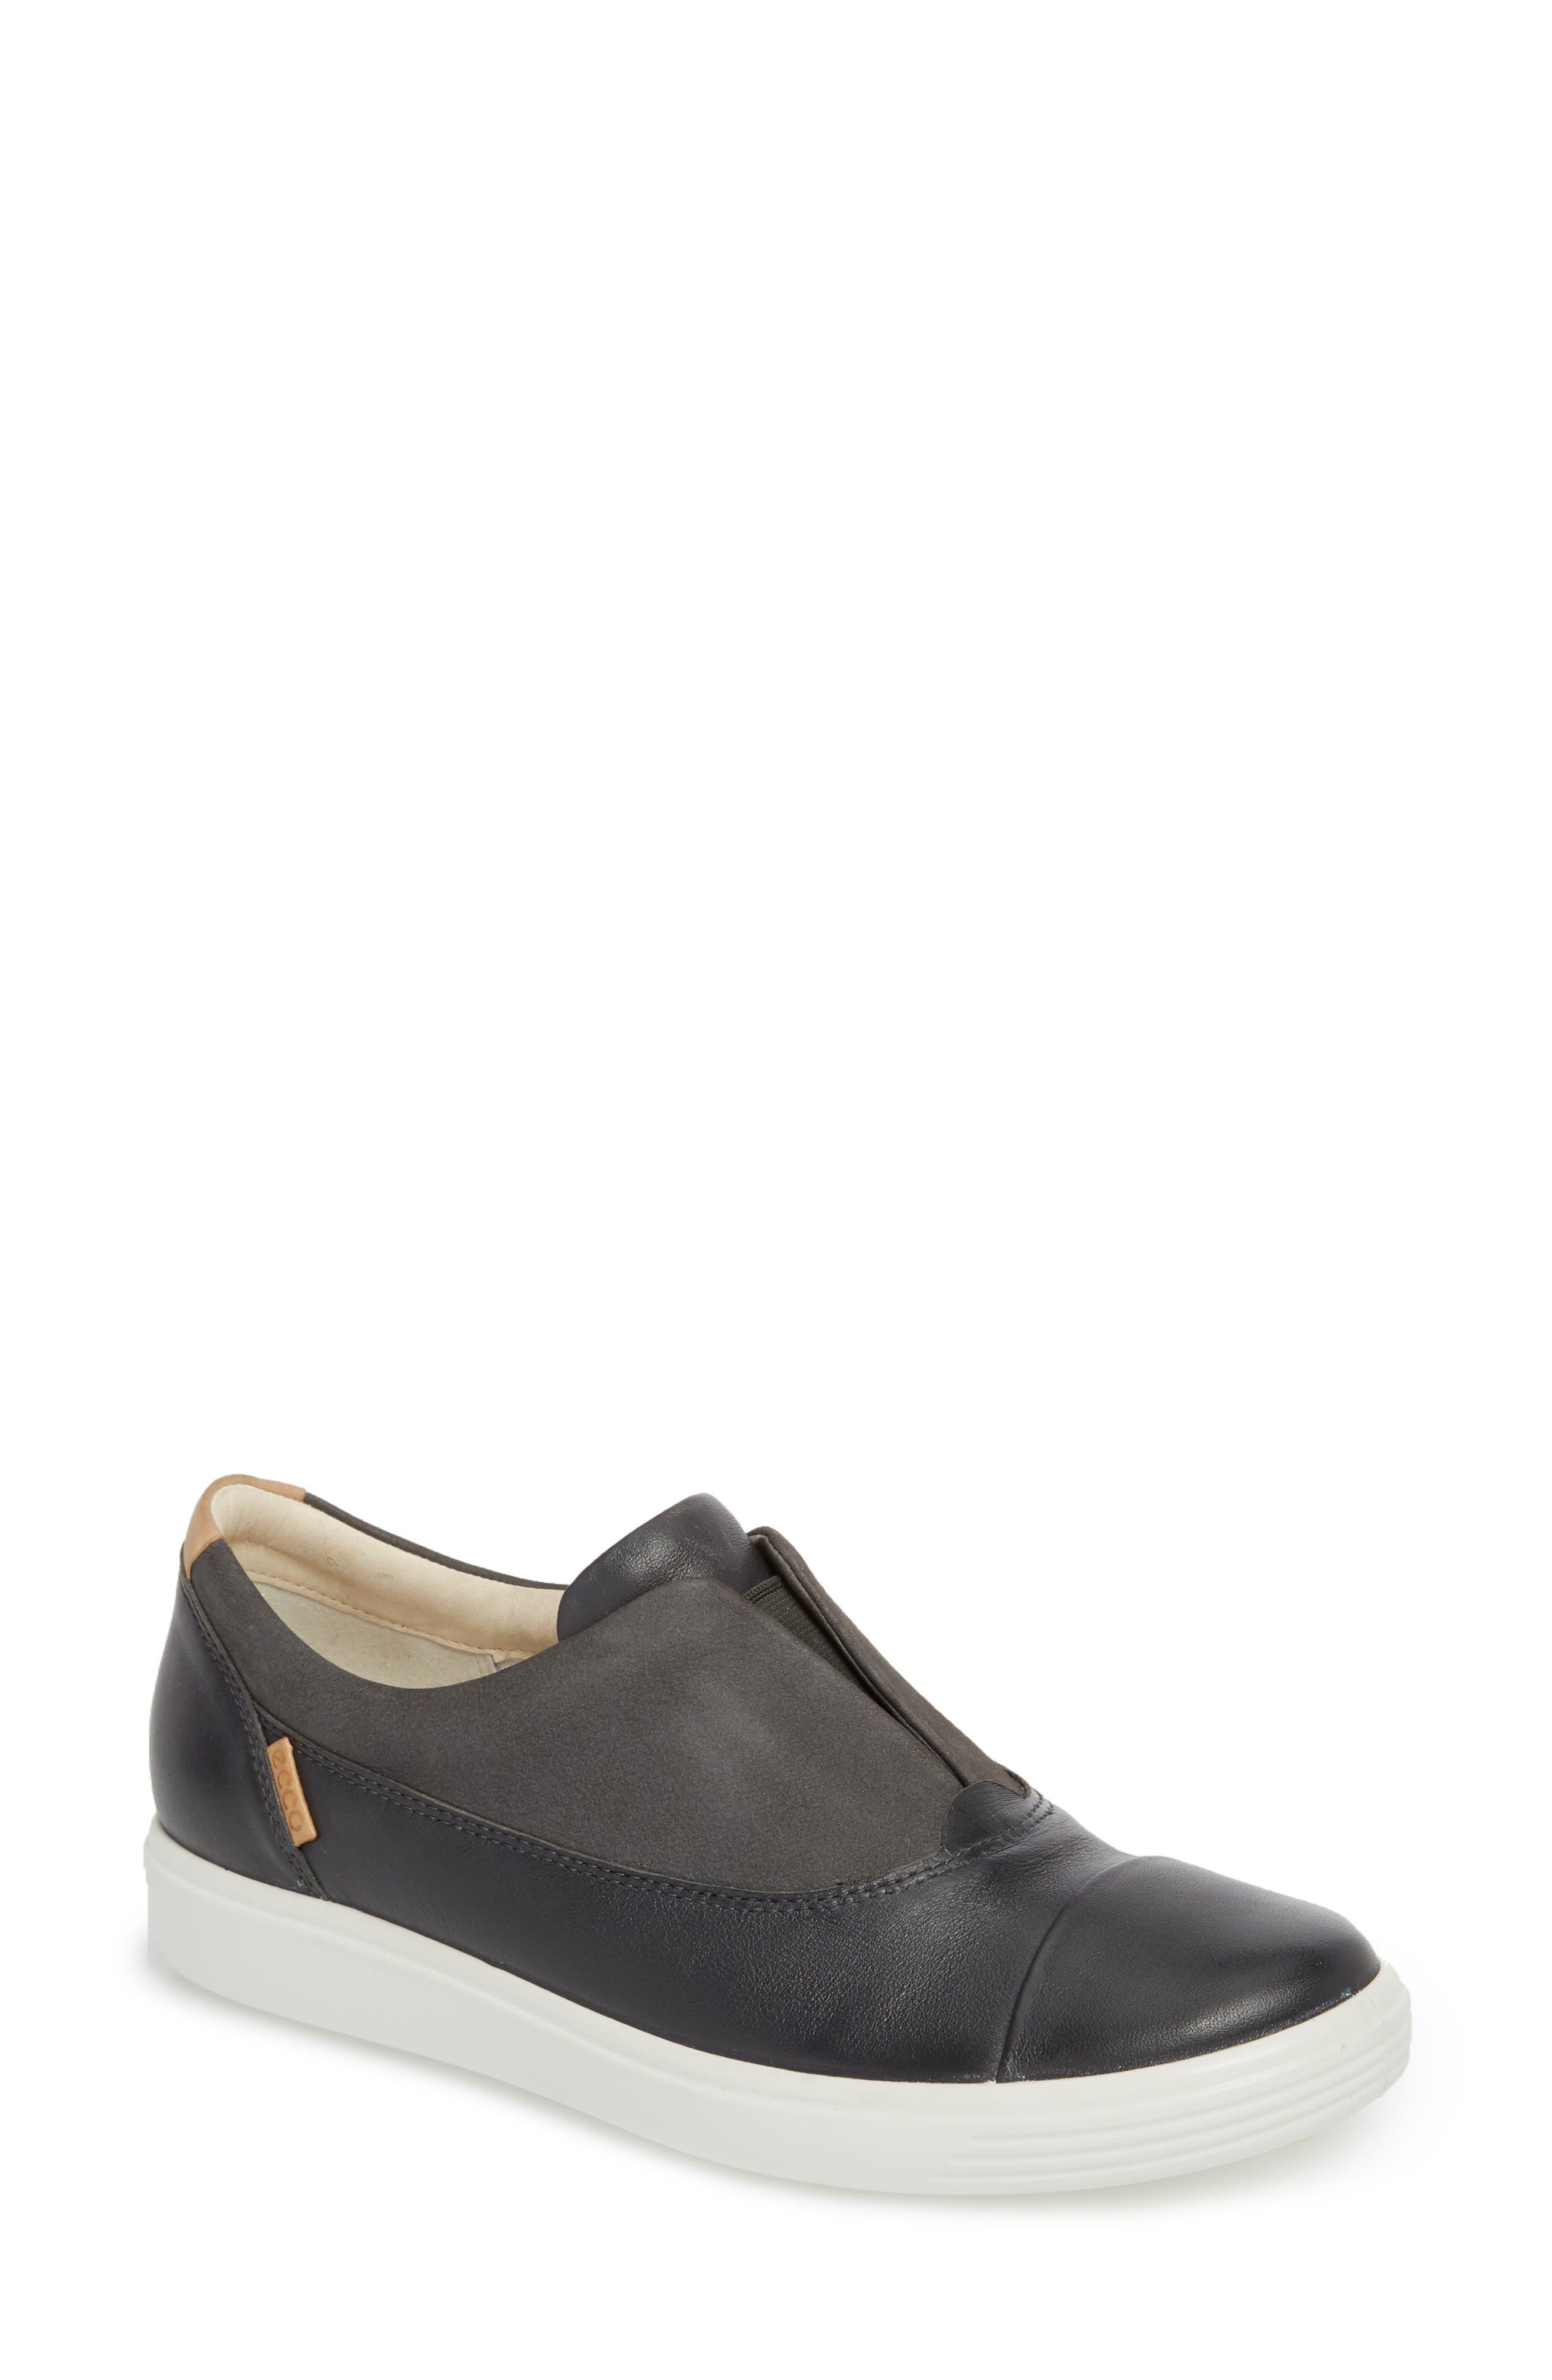 Soft 7 II Slip-On Sneaker,                         Main,                         color, DARK SHADOW LEATHER